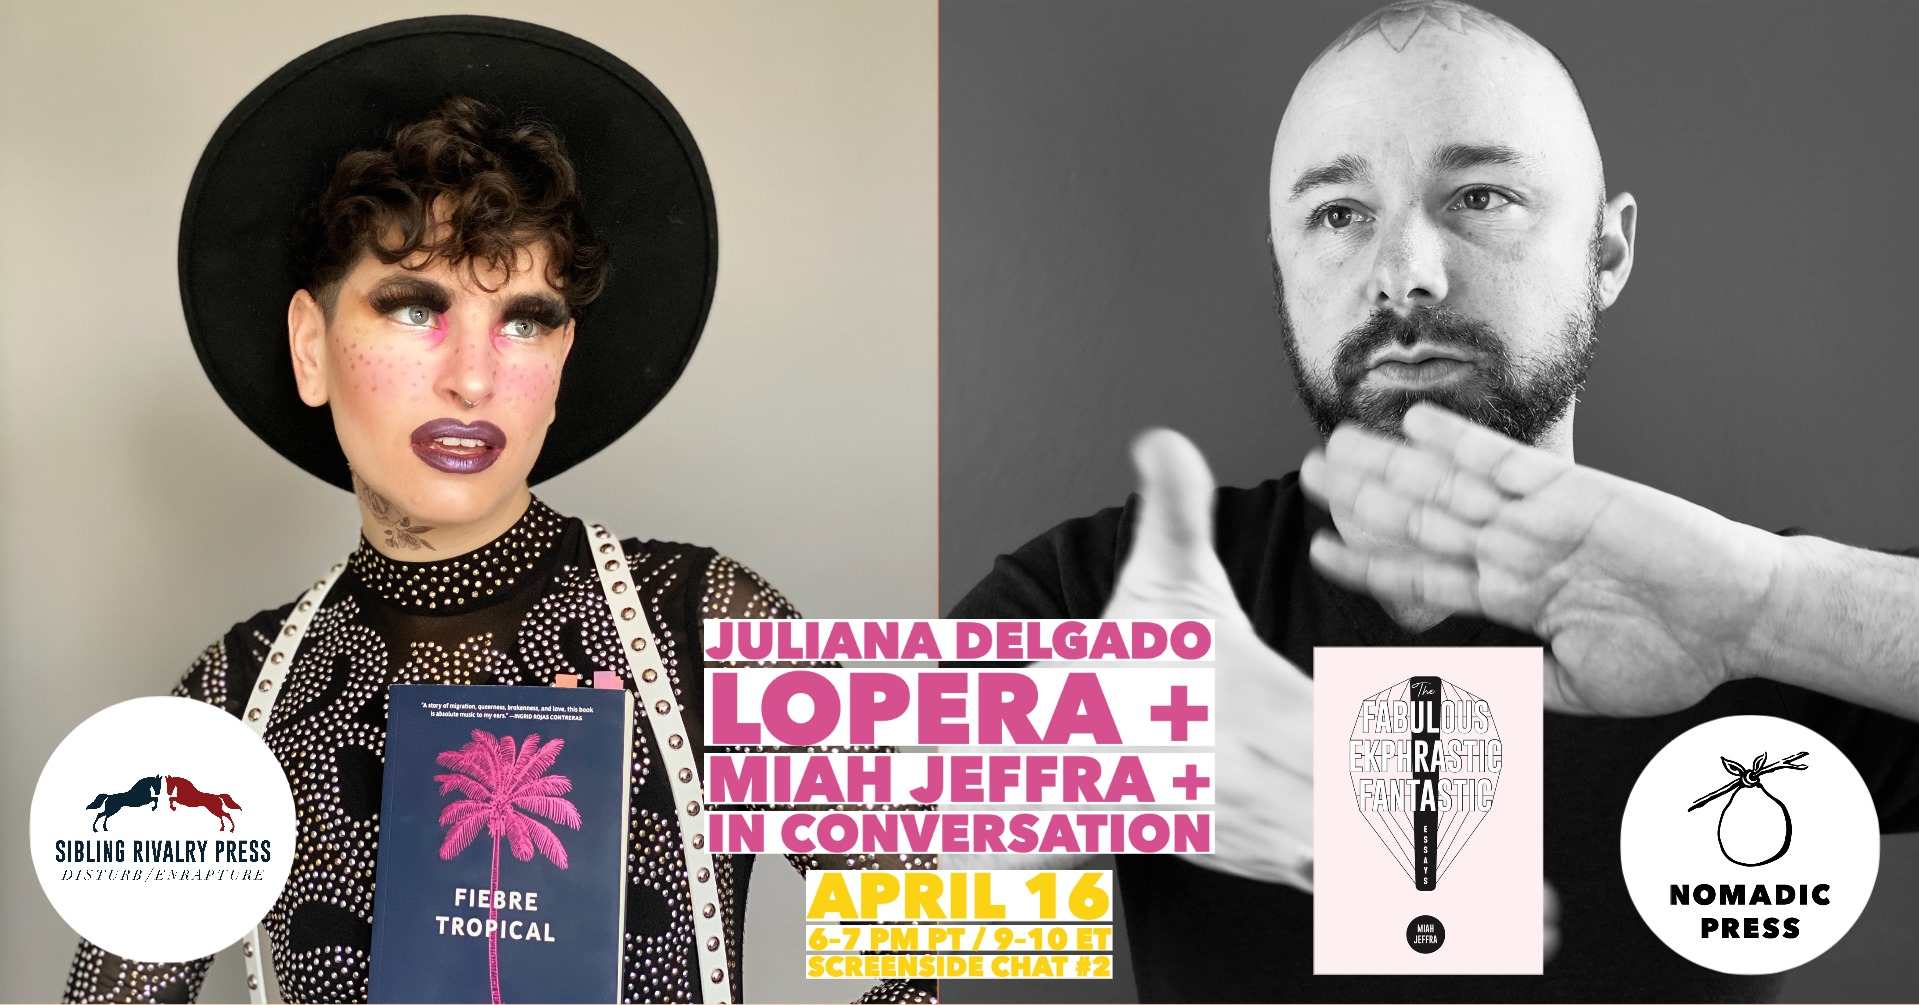 Screenside Chat #2- Juliana Delgado Lopera + Miah Jeffra